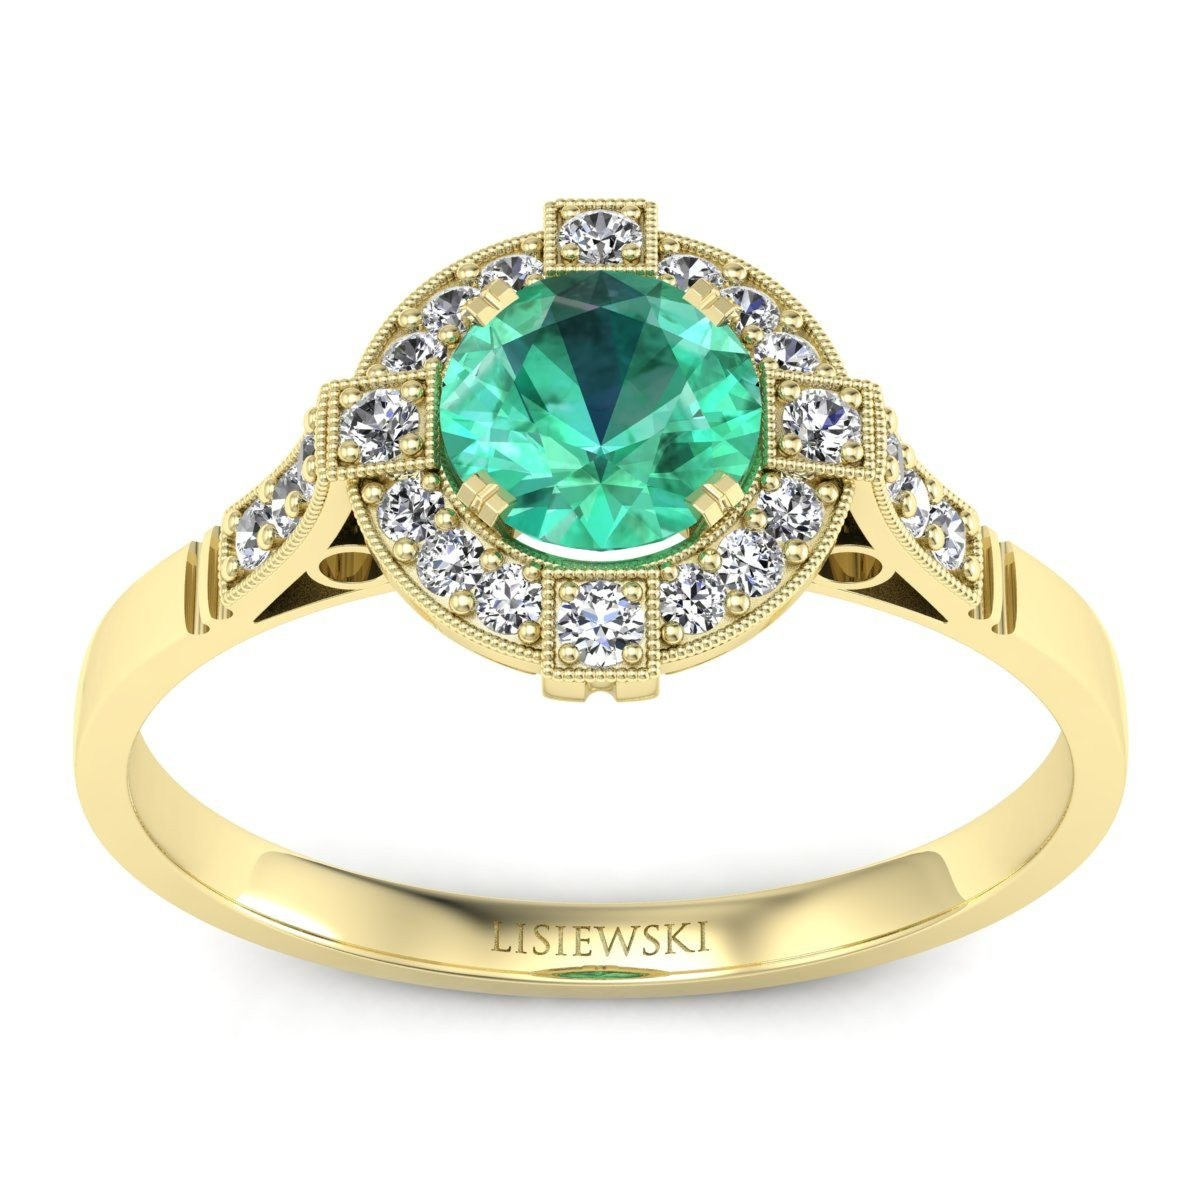 Audrey - Złoty pierścionek ze szmaragdem i diamentami